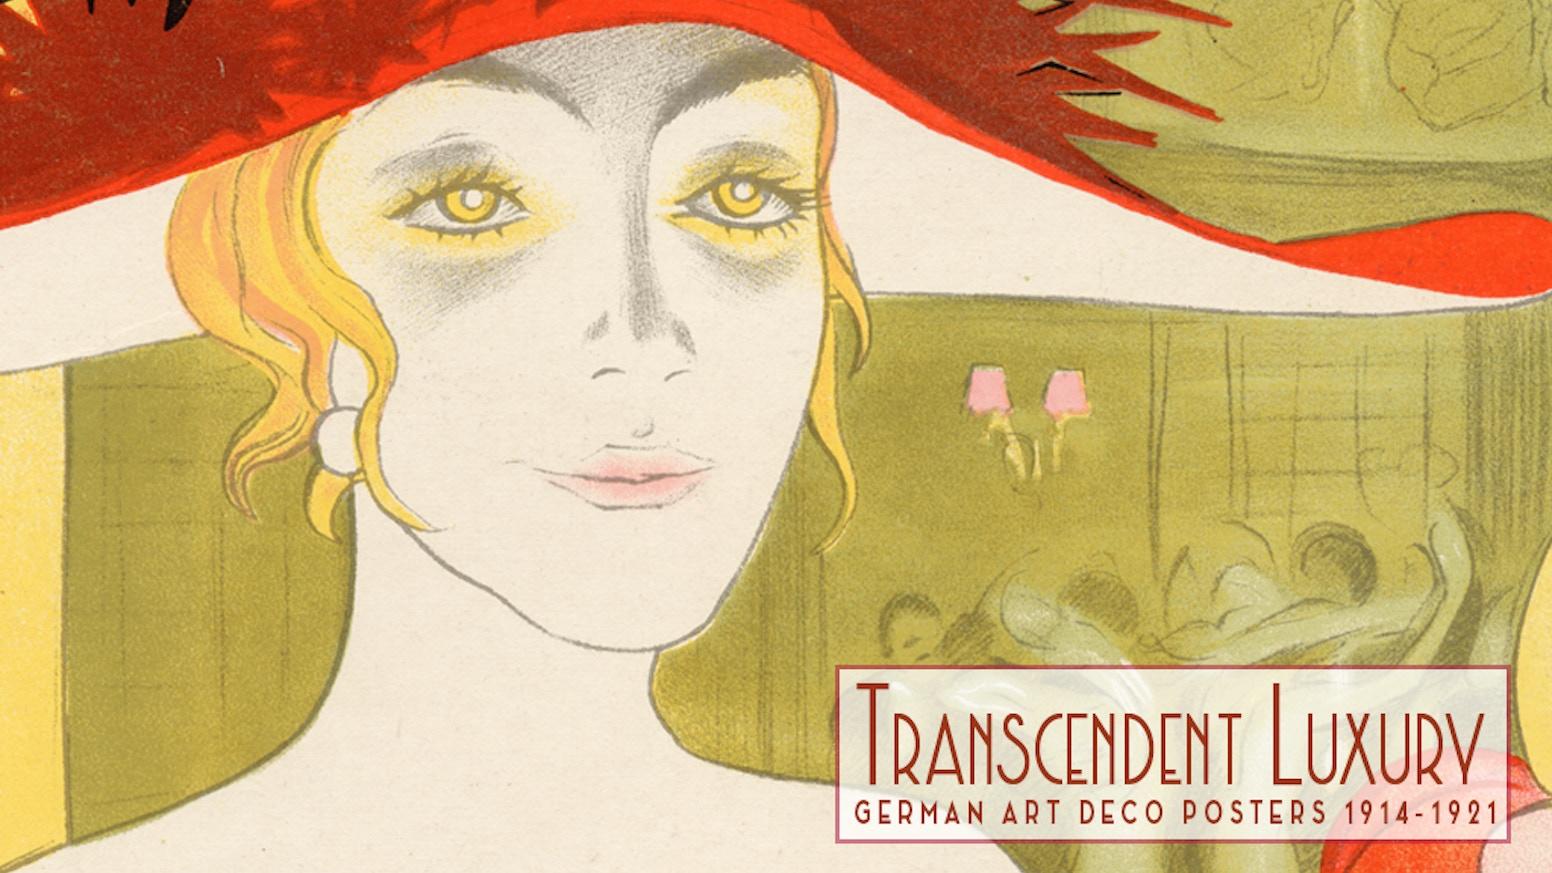 Rare German Art Deco Poster Masterpieces 1914-1921 by Thomas Negovan